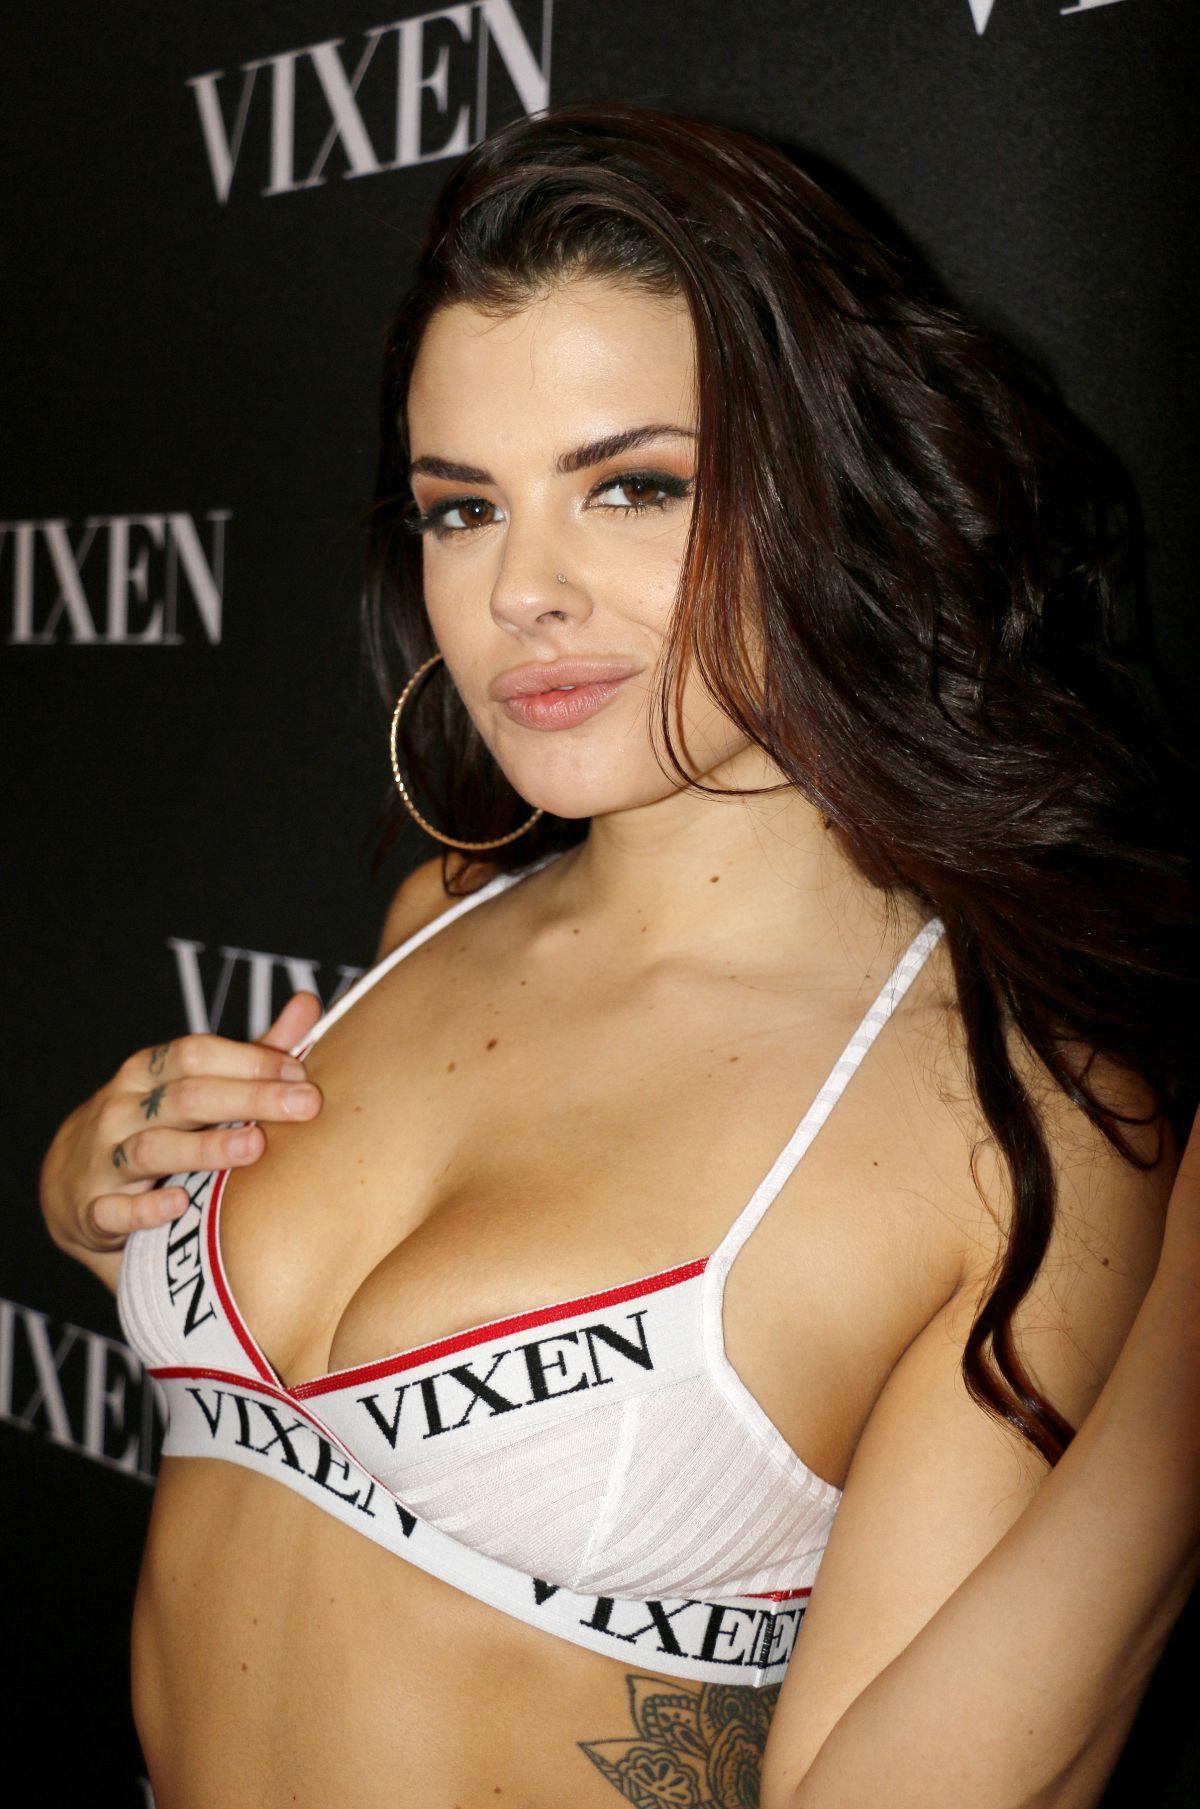 KEISHA GREY at 2017 AVN Adult Entertainment Expo in Las